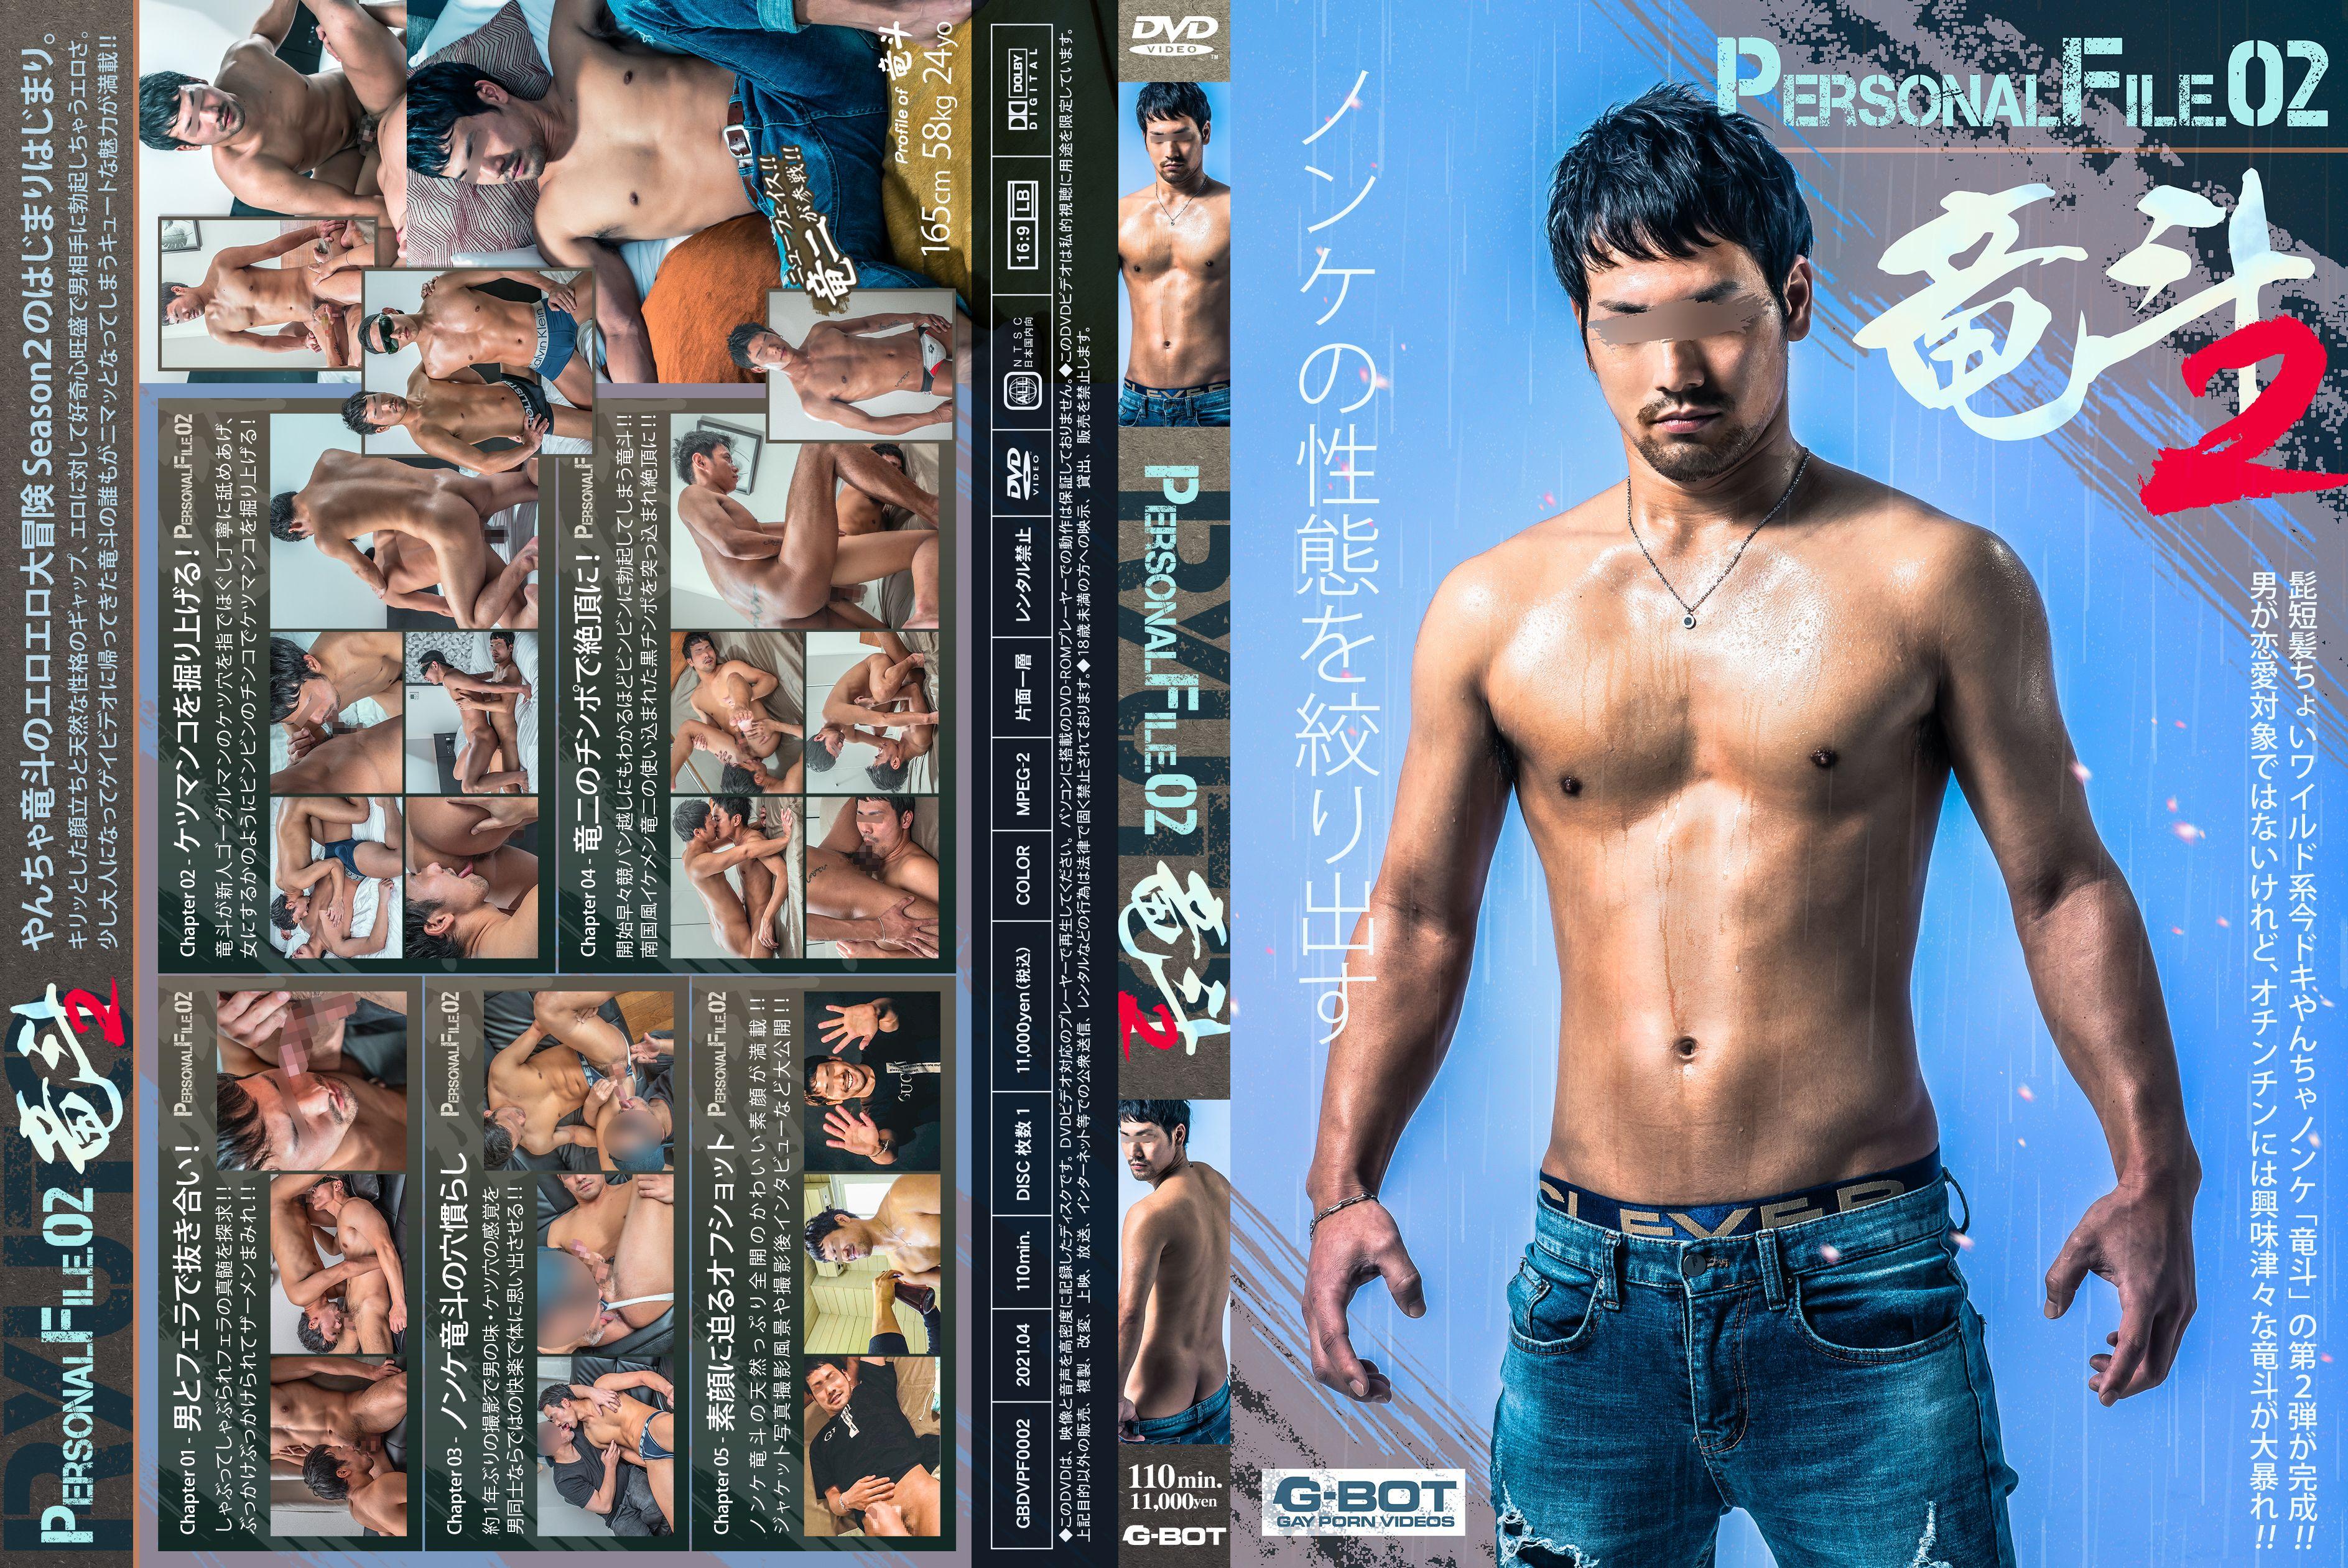 G-BOT – PERSONAL FILE 02 竜斗2 – GBT049